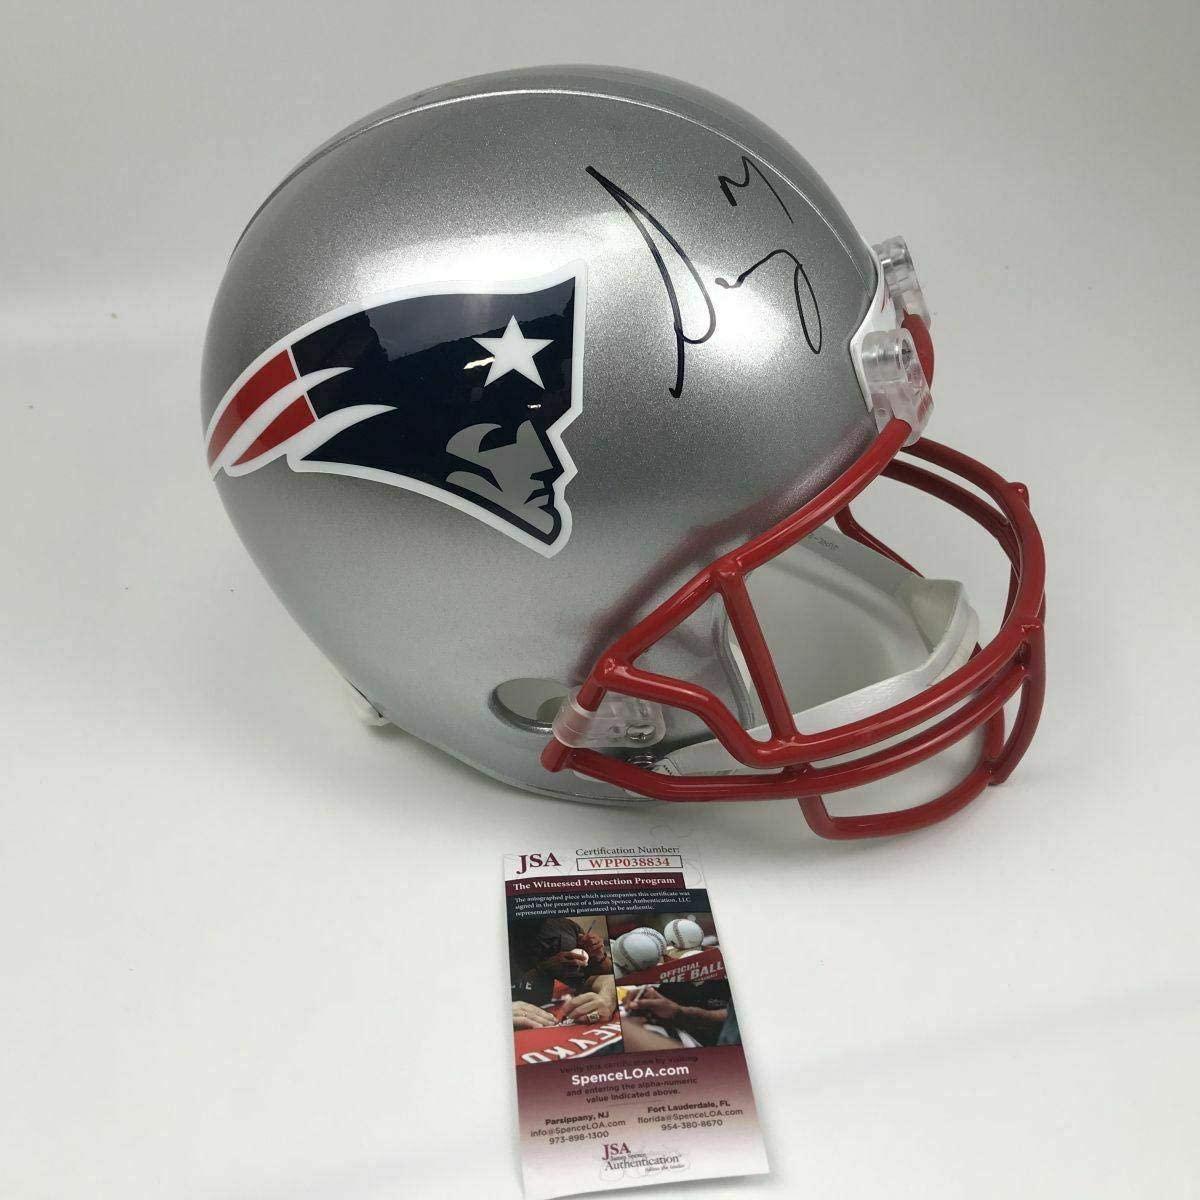 Autographed/Signed SONY MICHEL New England Patriots Full Size FS Helmet JSA COA - Autographed NFL Helmets